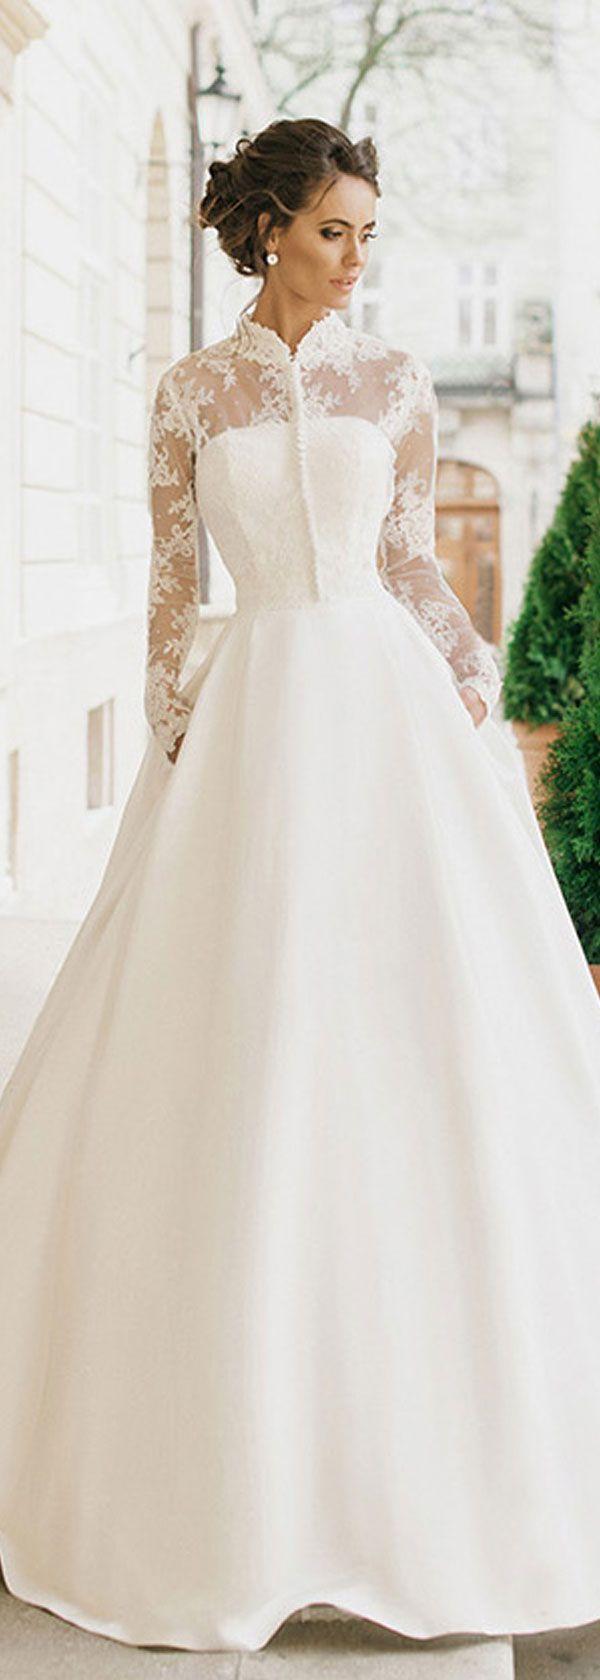 Gorgeous Satin High Collar NecklineA-line Wedding Dresses With Detachable…